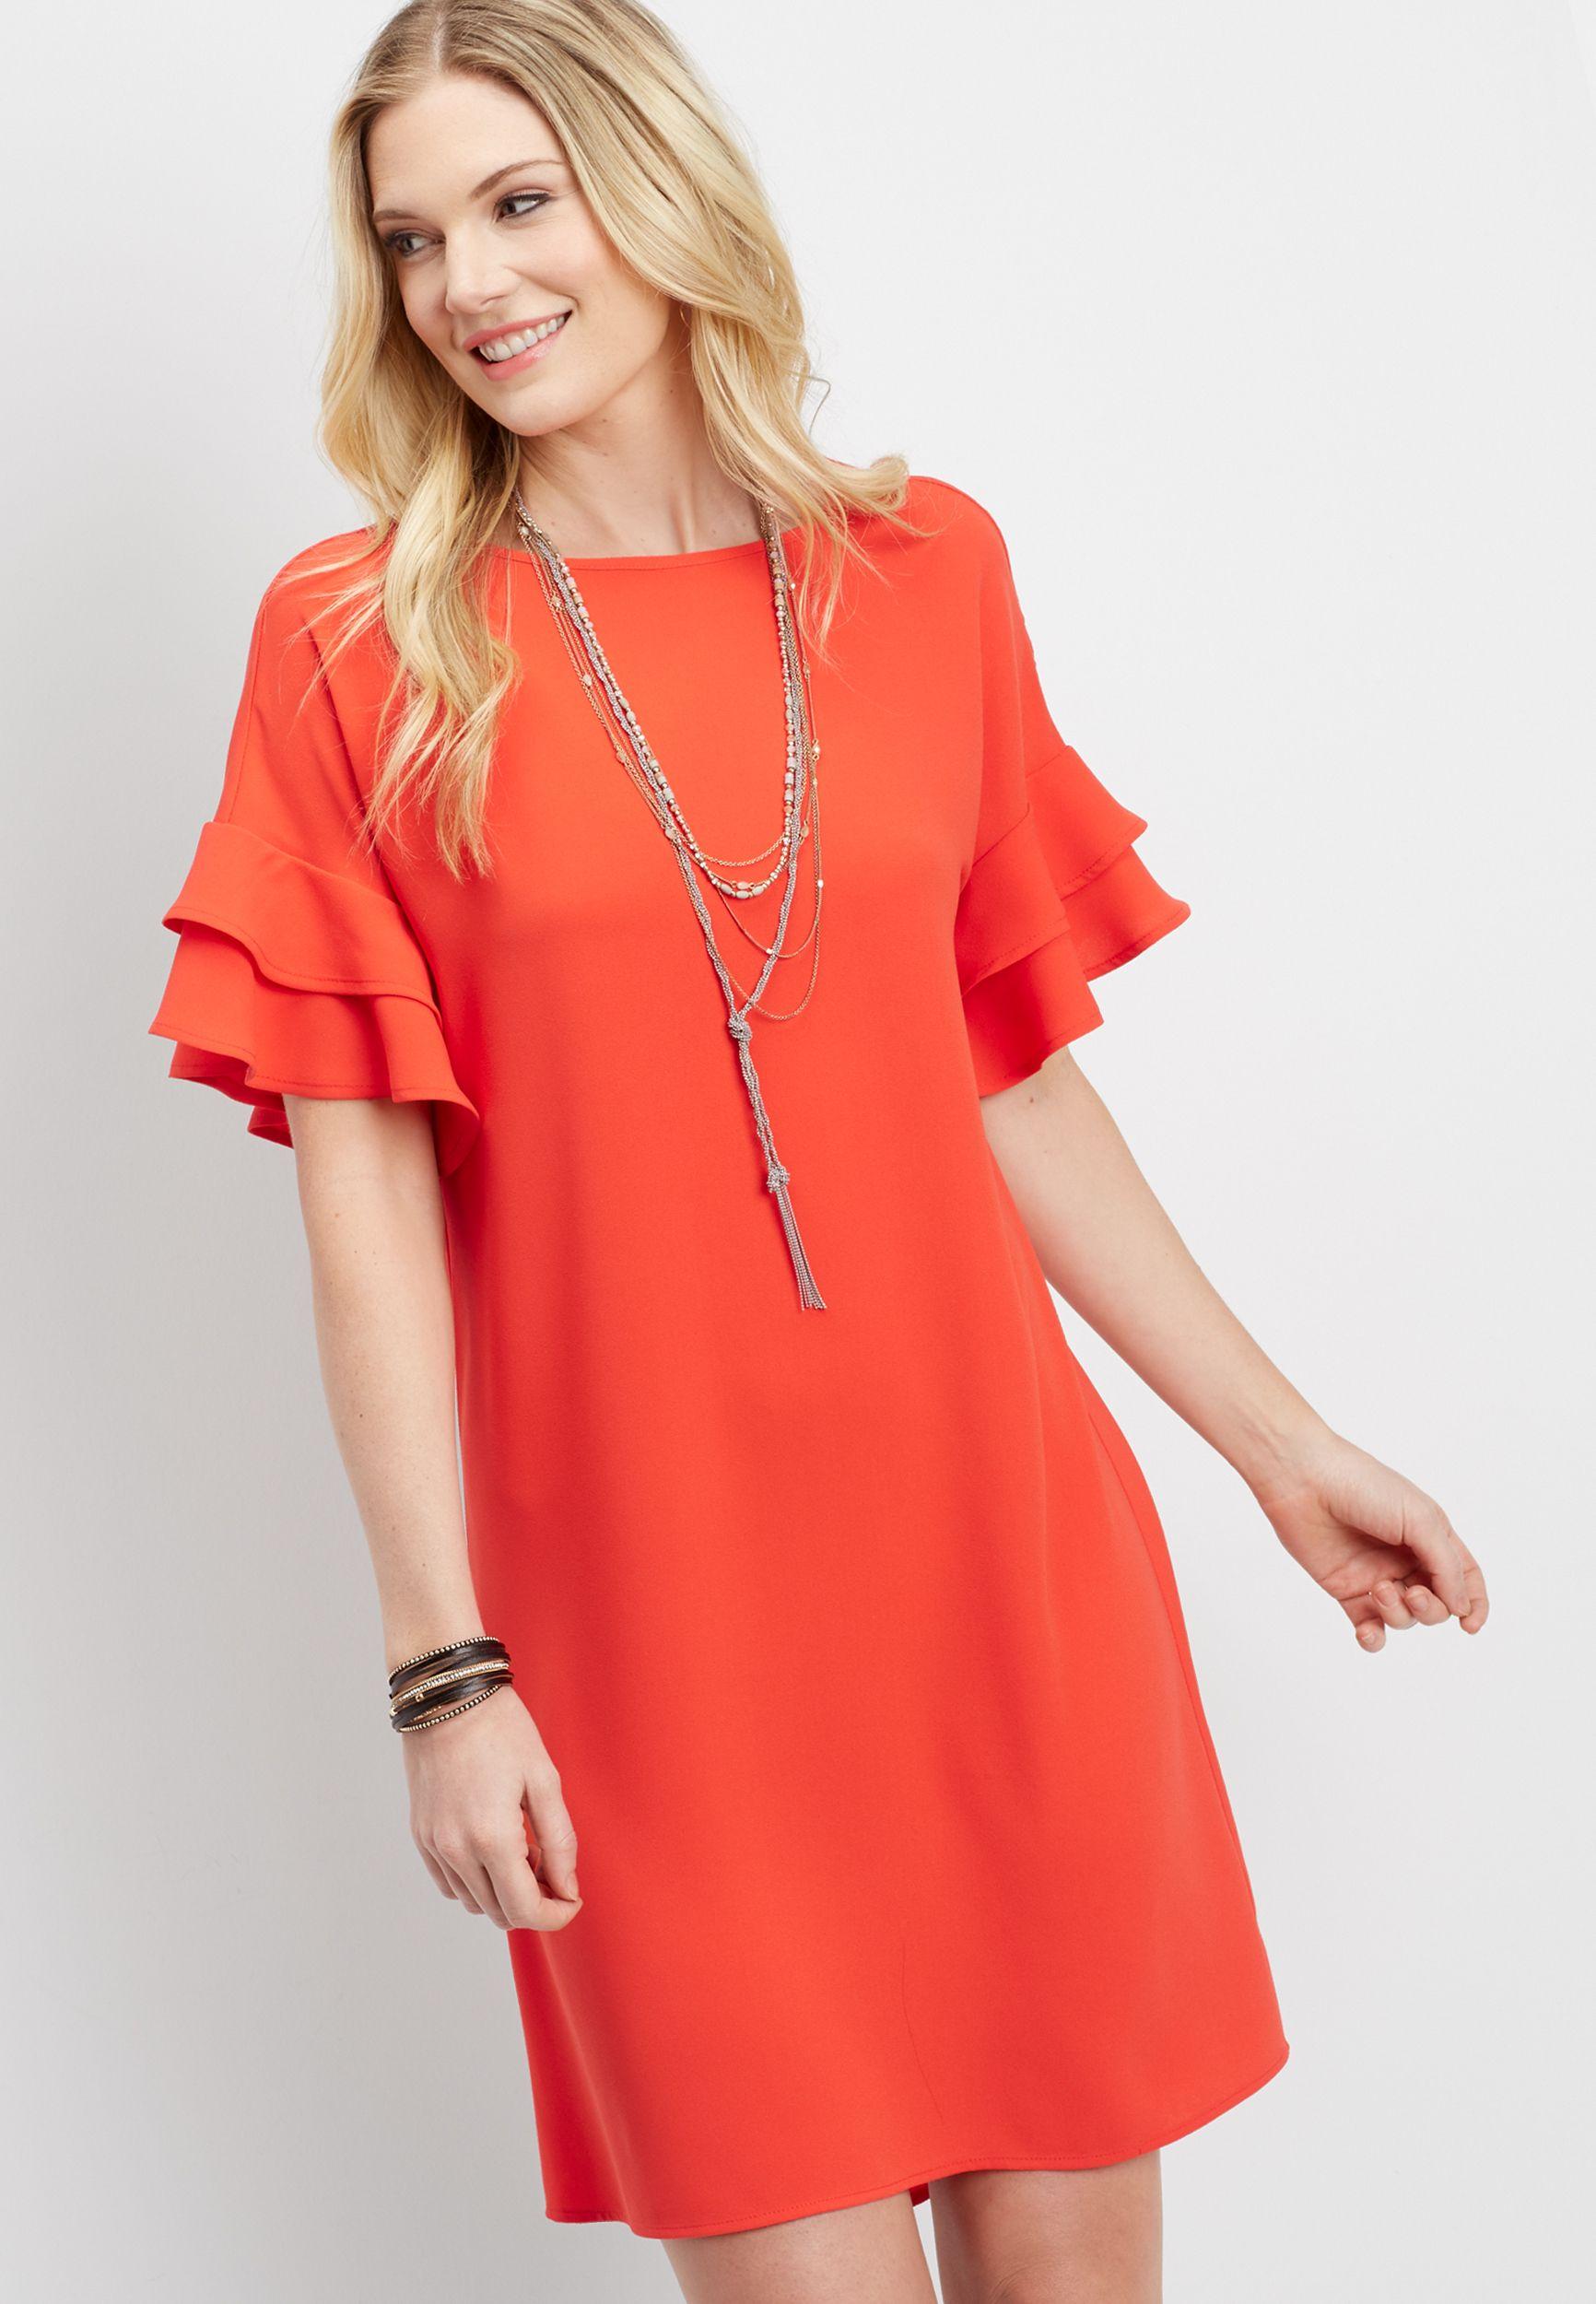 Ruffle Sleeve Shift Dress Original Price 39 00 Available At Maurices Shift Dress Dresses Short Sleeve Dresses [ 2500 x 1732 Pixel ]